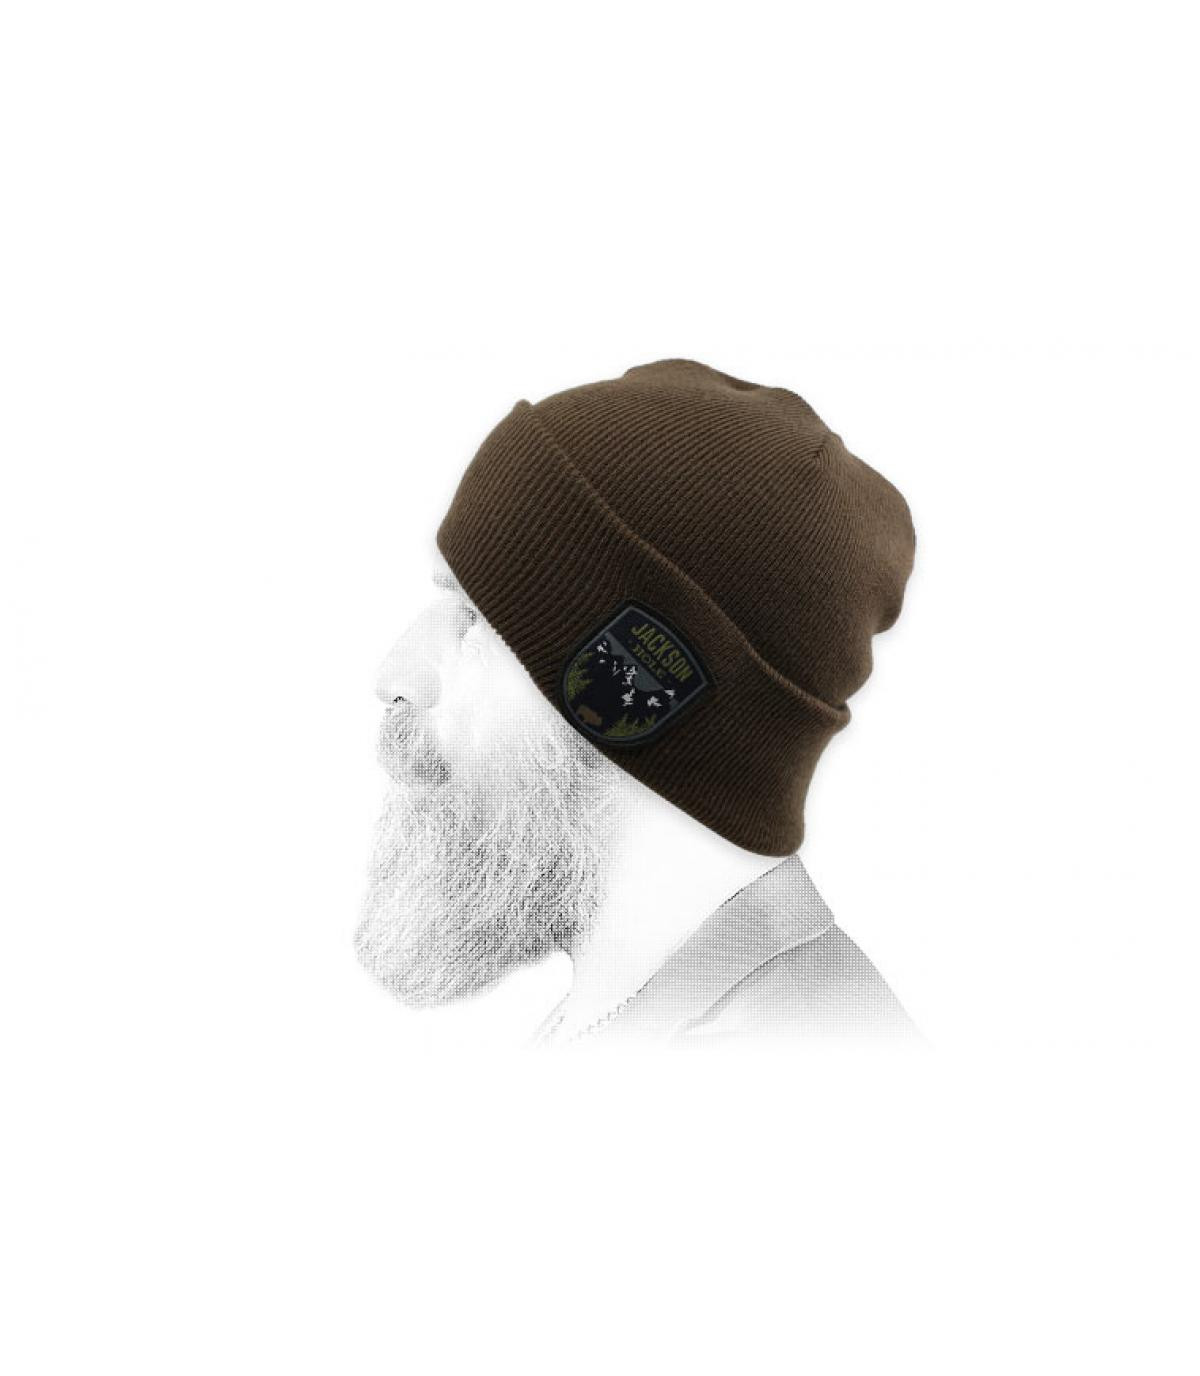 mütze jackson hole braun